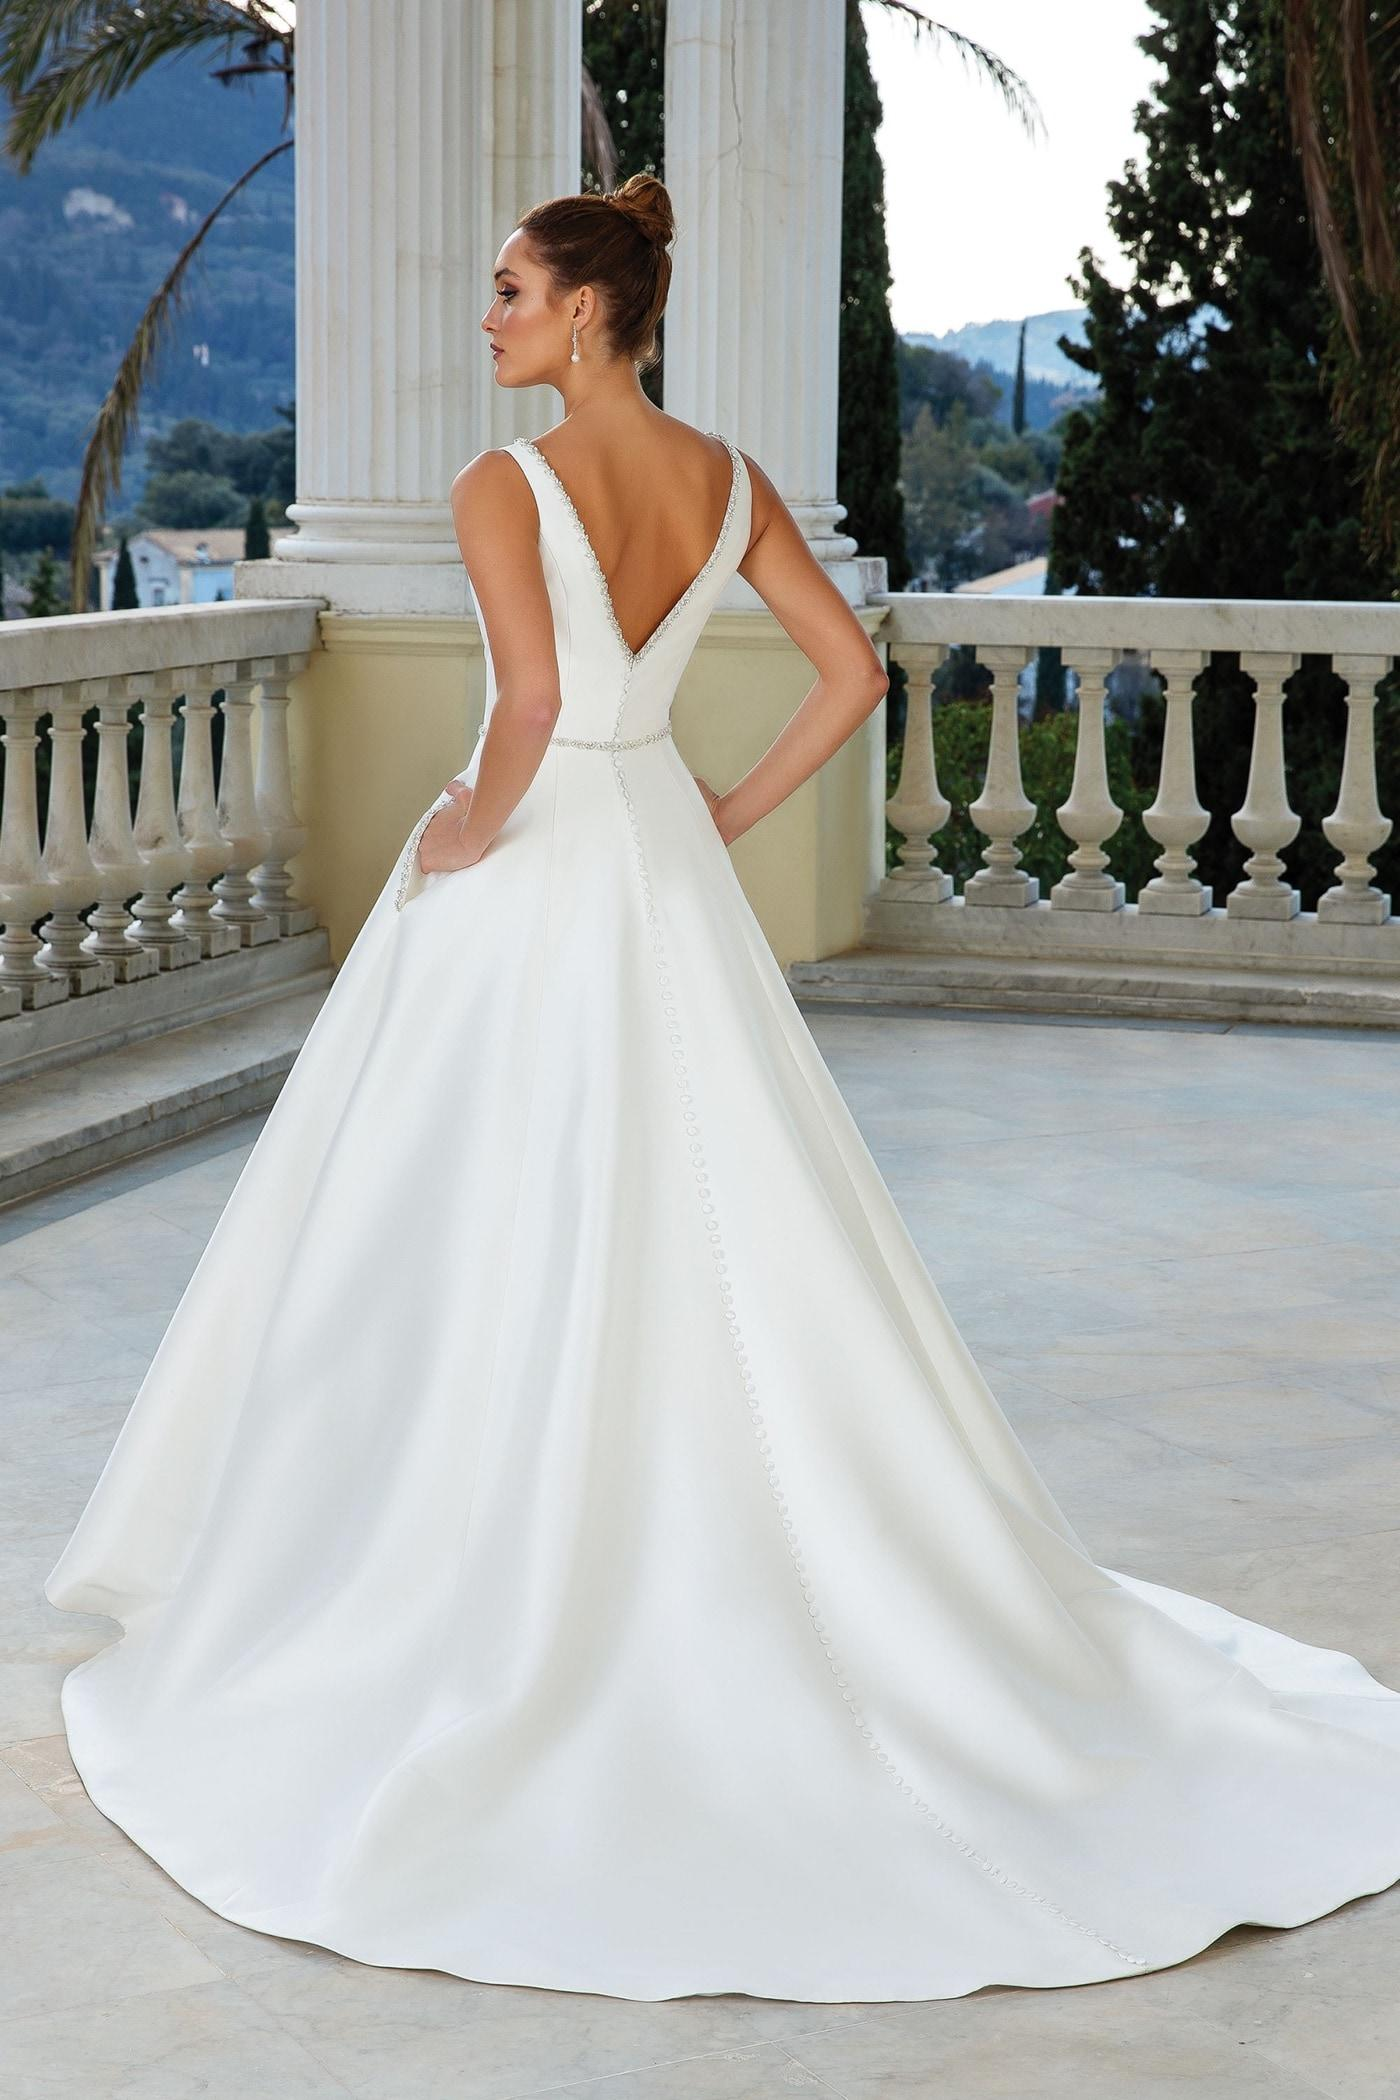 taschen for wedding outfits